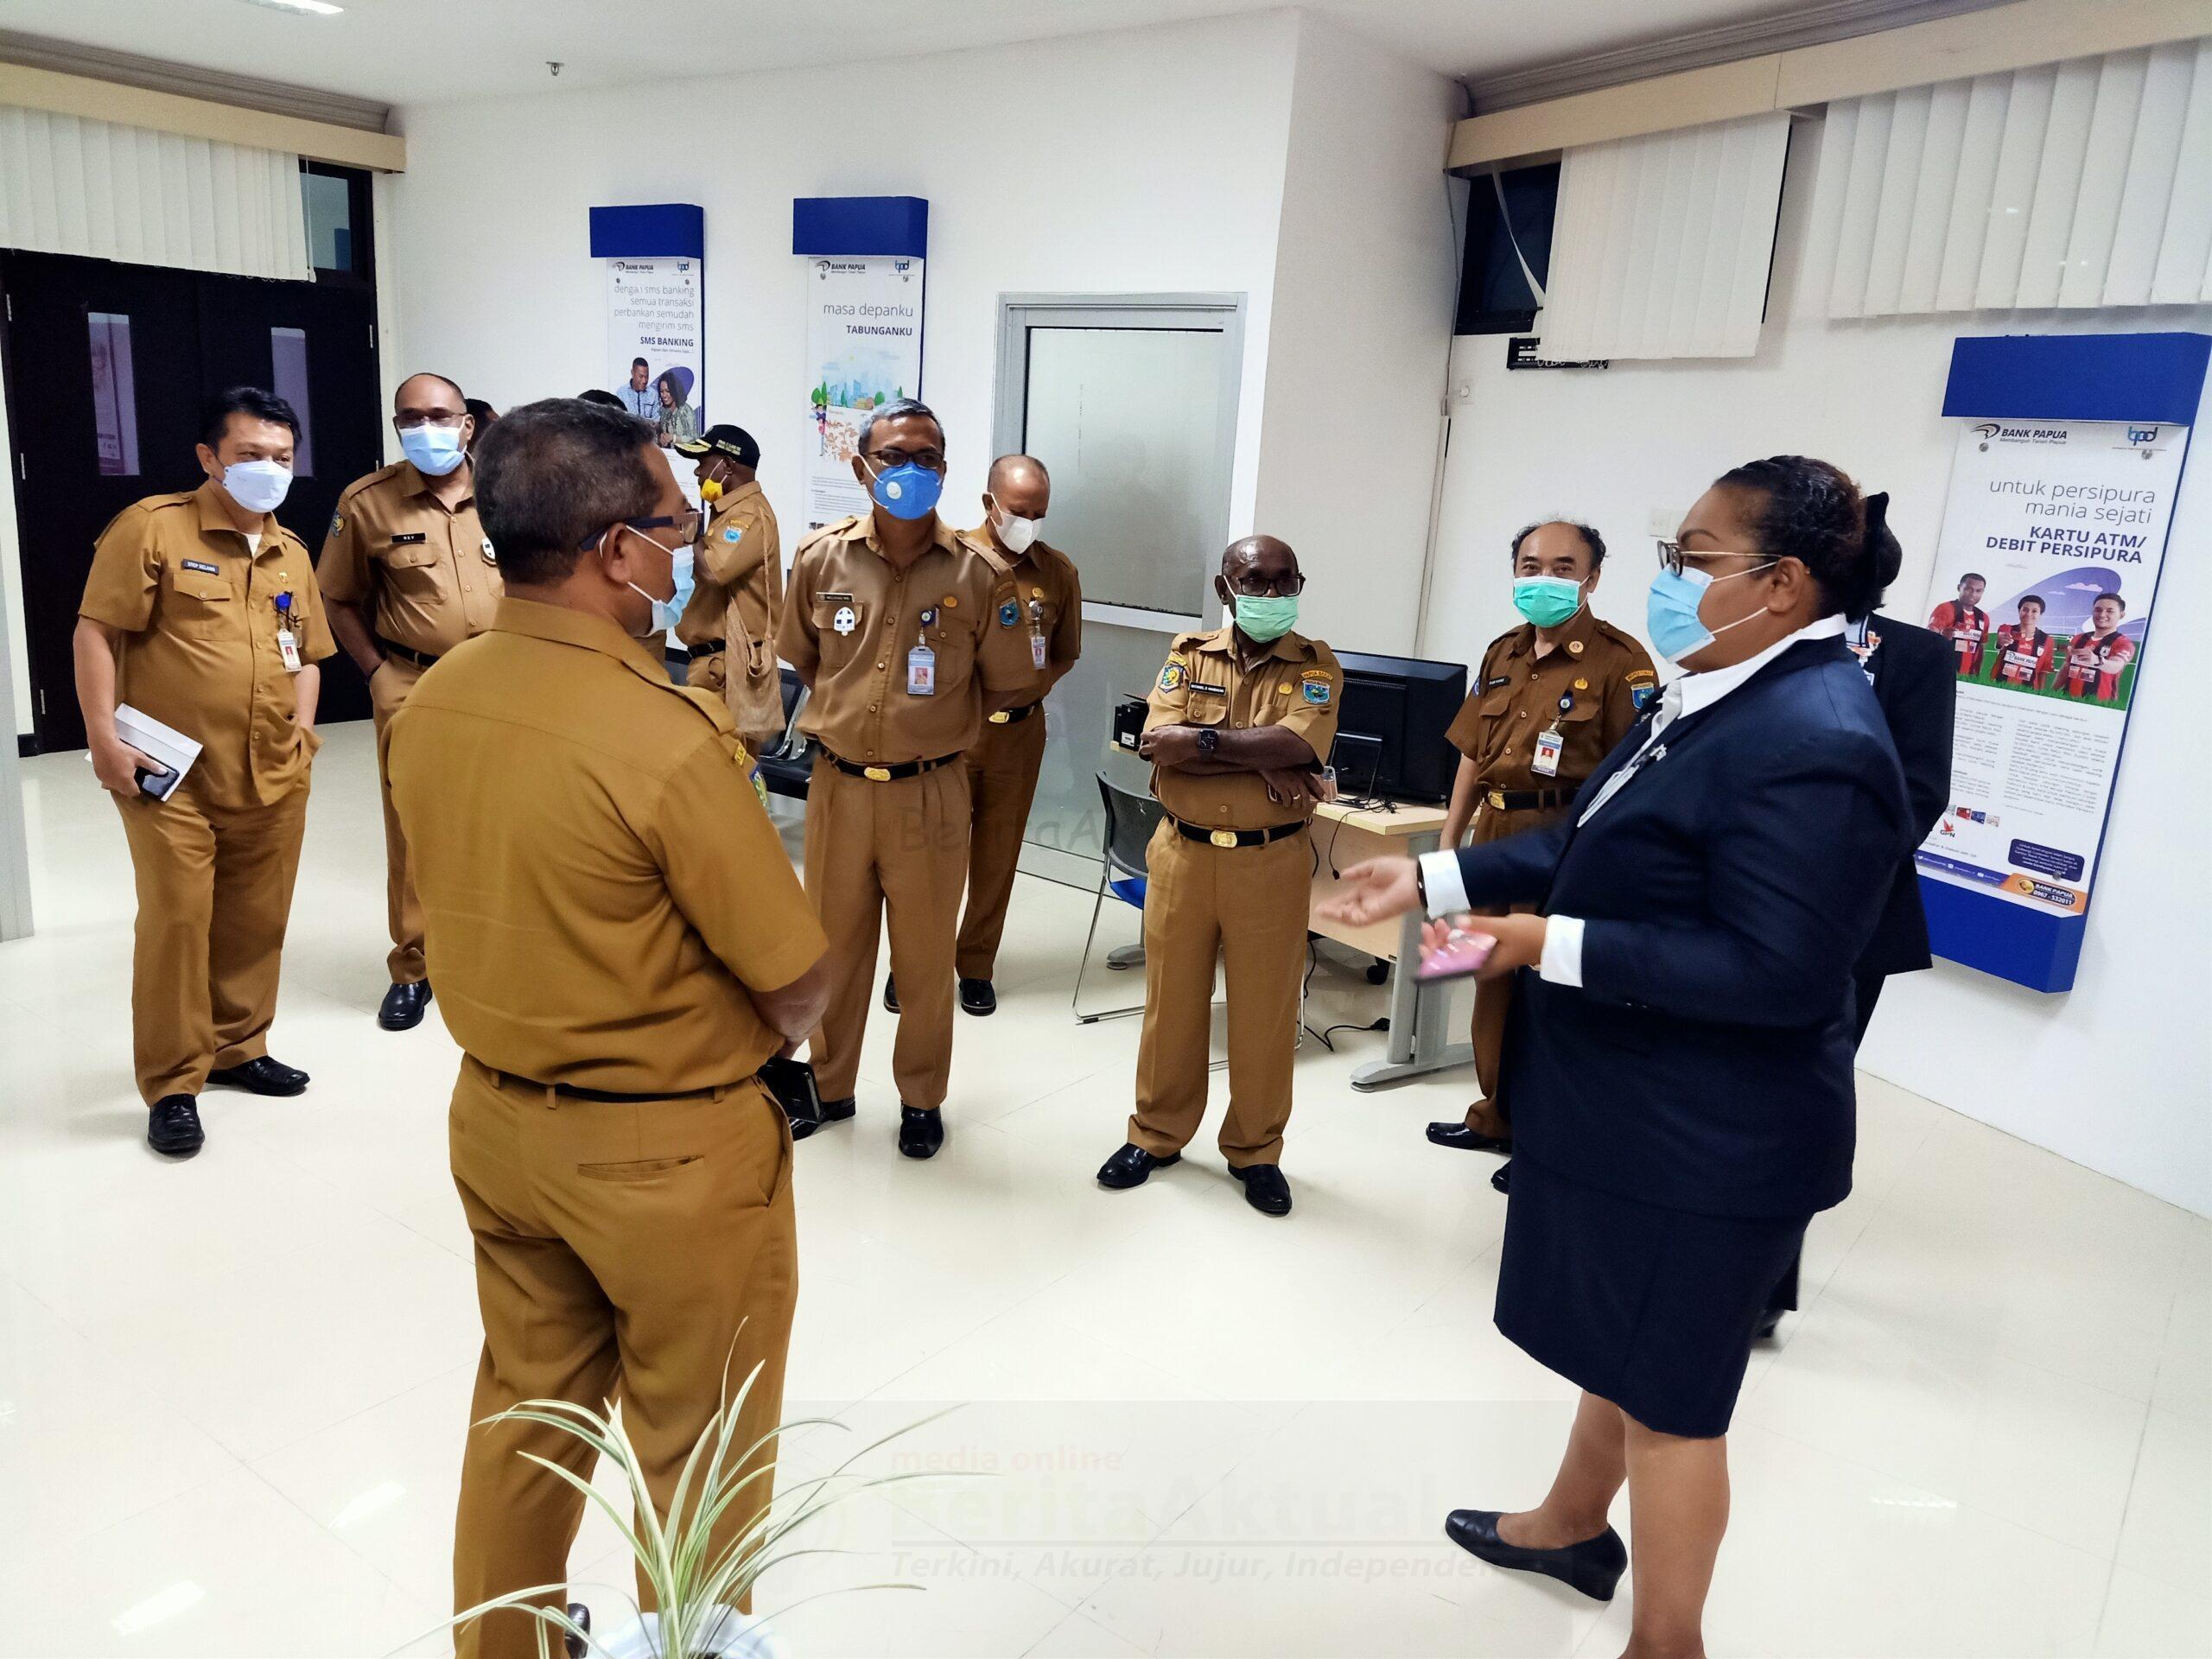 Kantor Cabang Pembantu Bank Papua Kini Resmi Beroperasi di Kantor Gubernur Arfai 1 IMG20210111112042 scaled